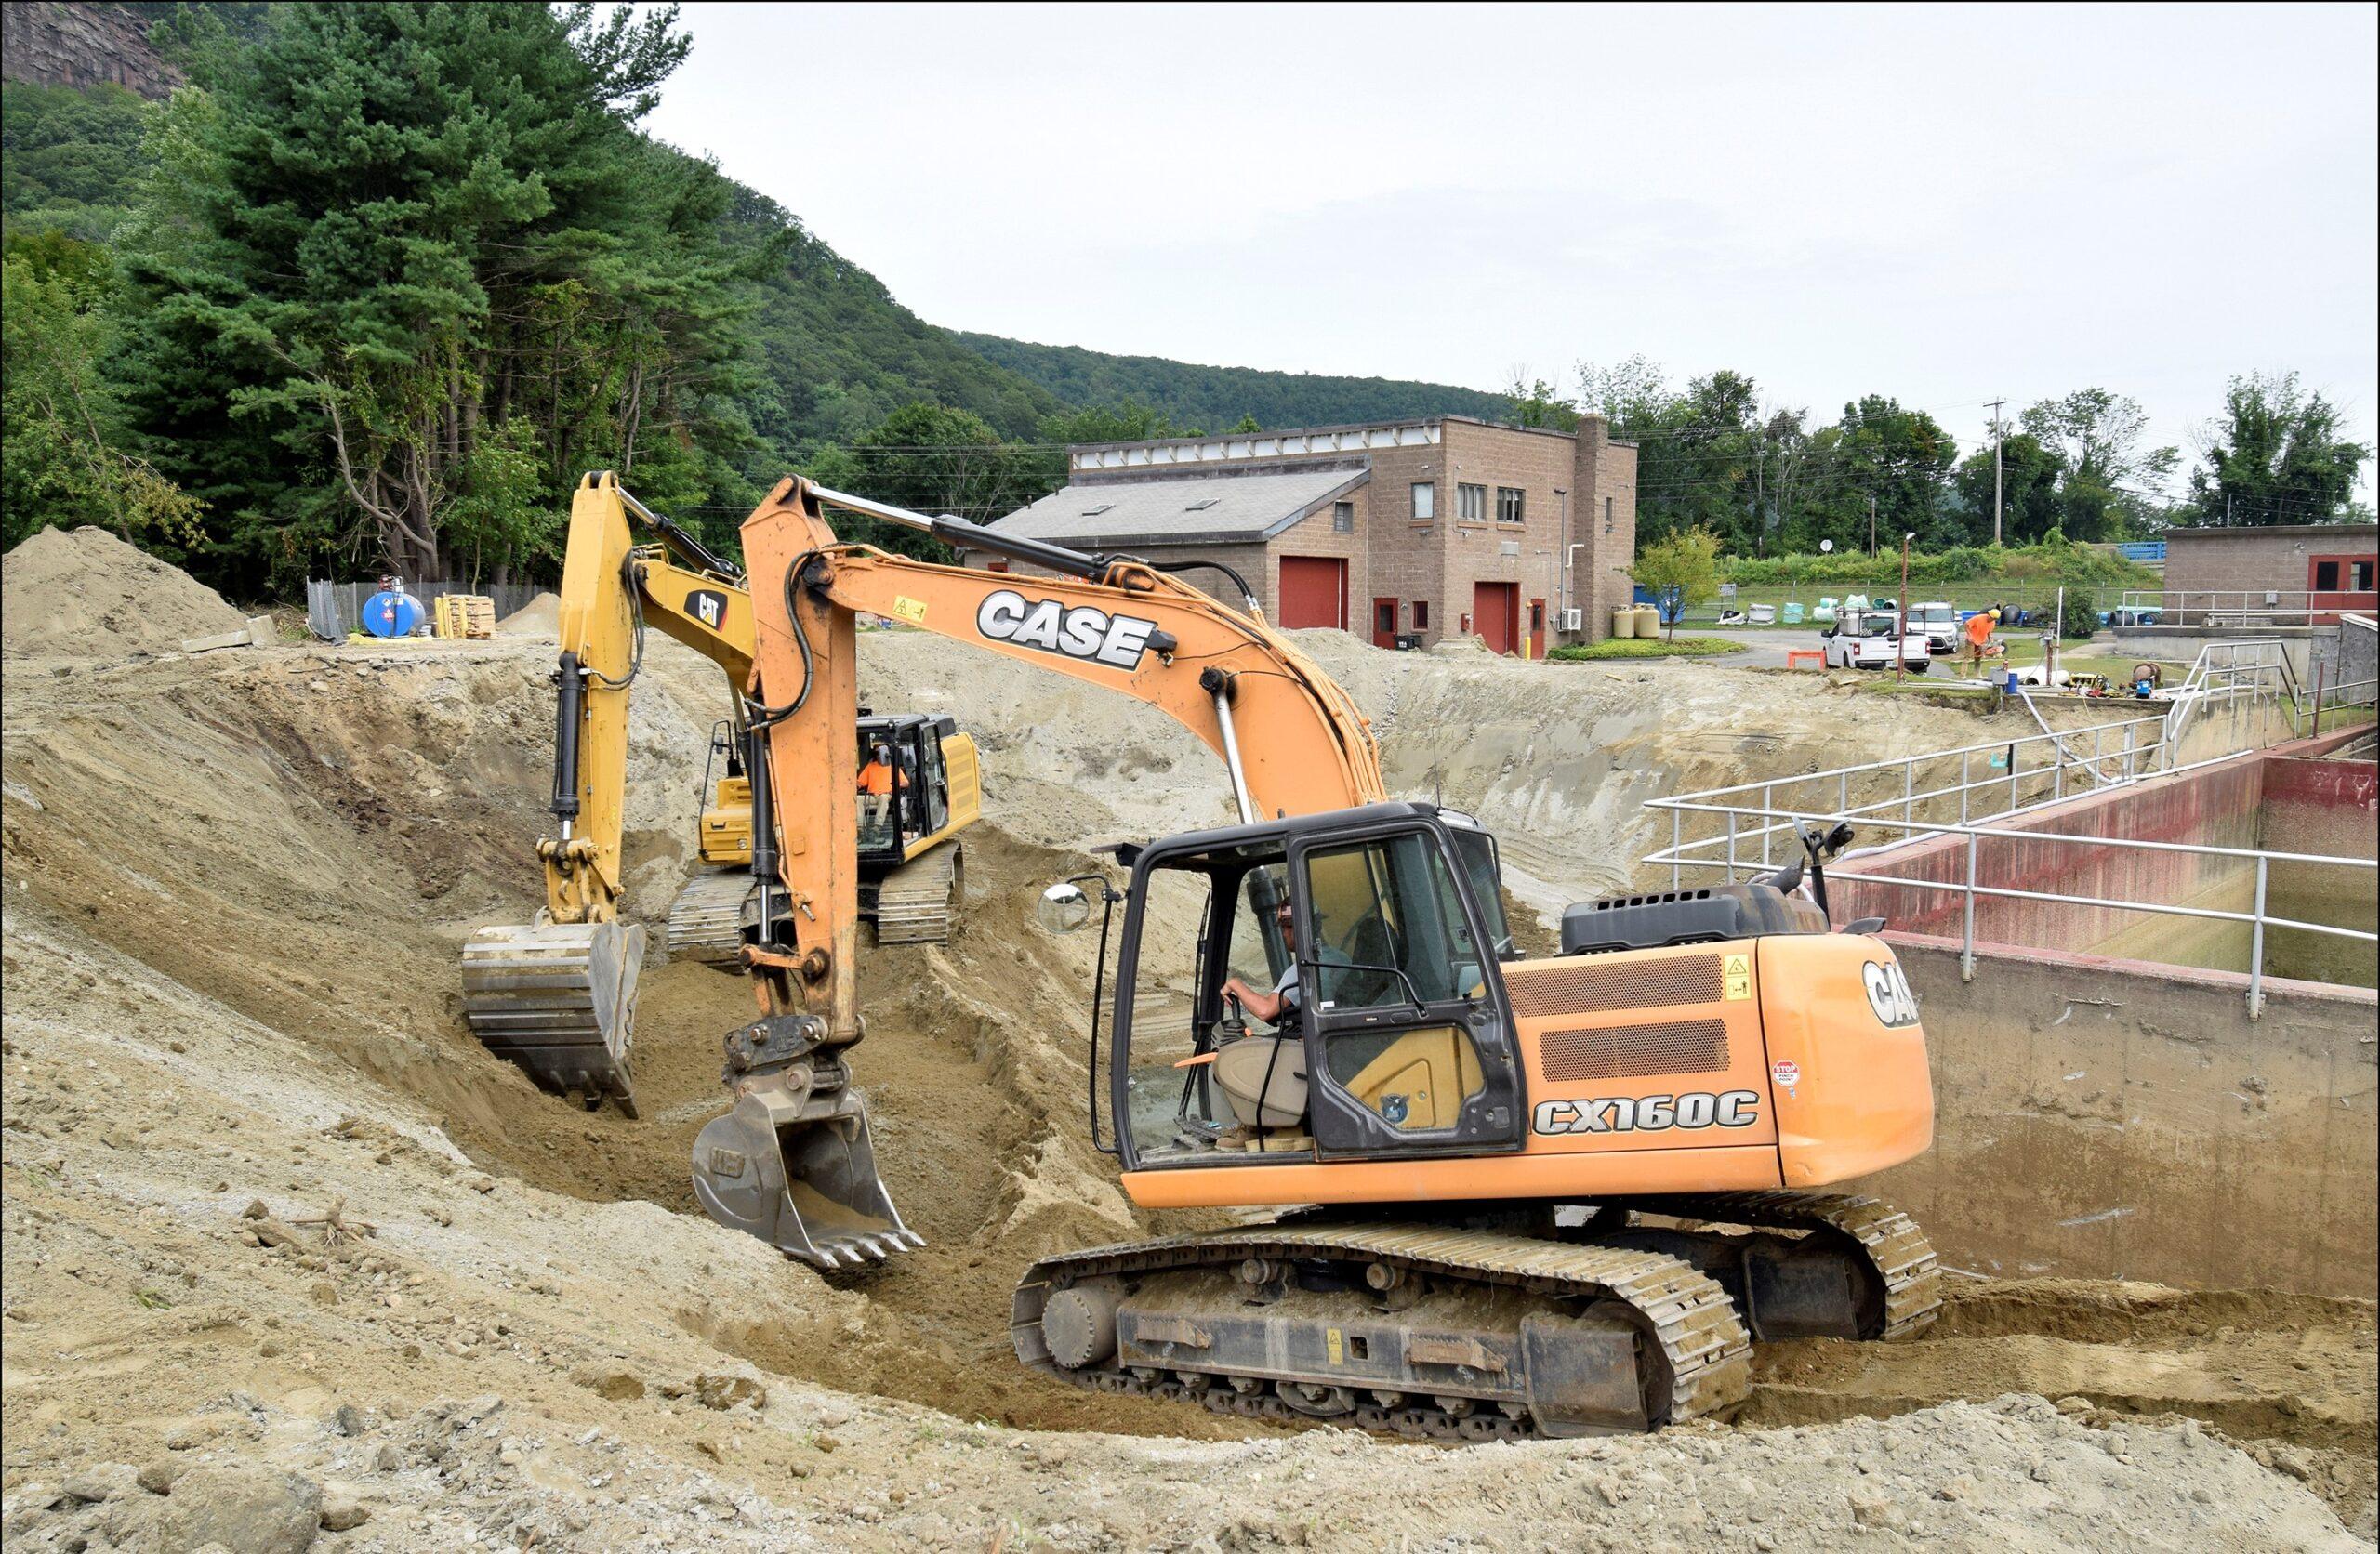 I2105-Clarifier Excavation